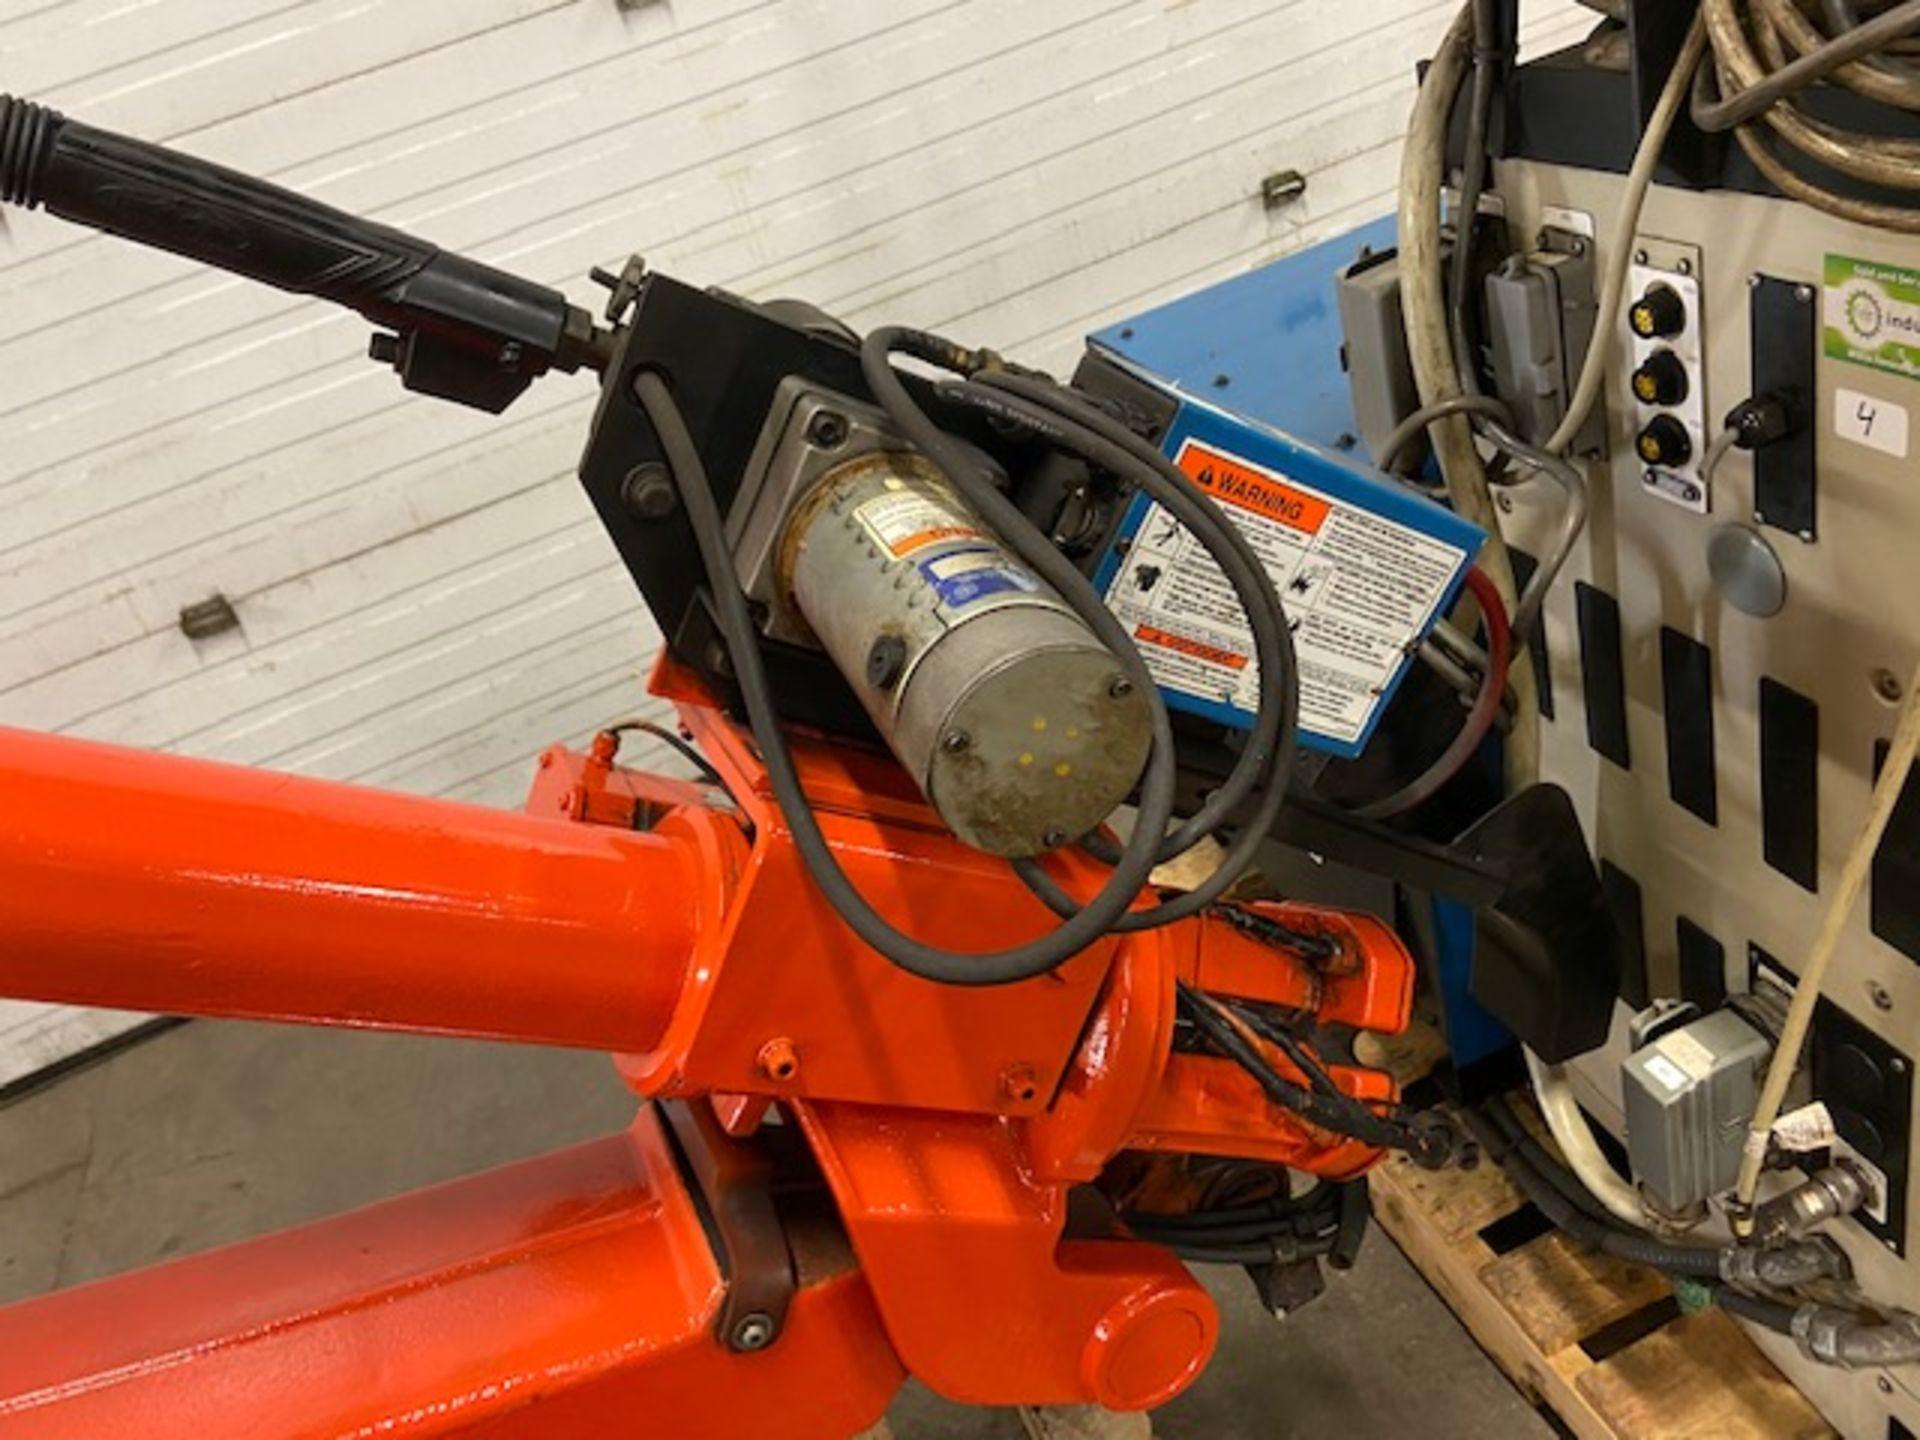 2004 ABB Robot IRB 2400 Welding Robot M2000 Control with Miller Deltaweld 452 450 Amp Mig Welder - Image 4 of 4